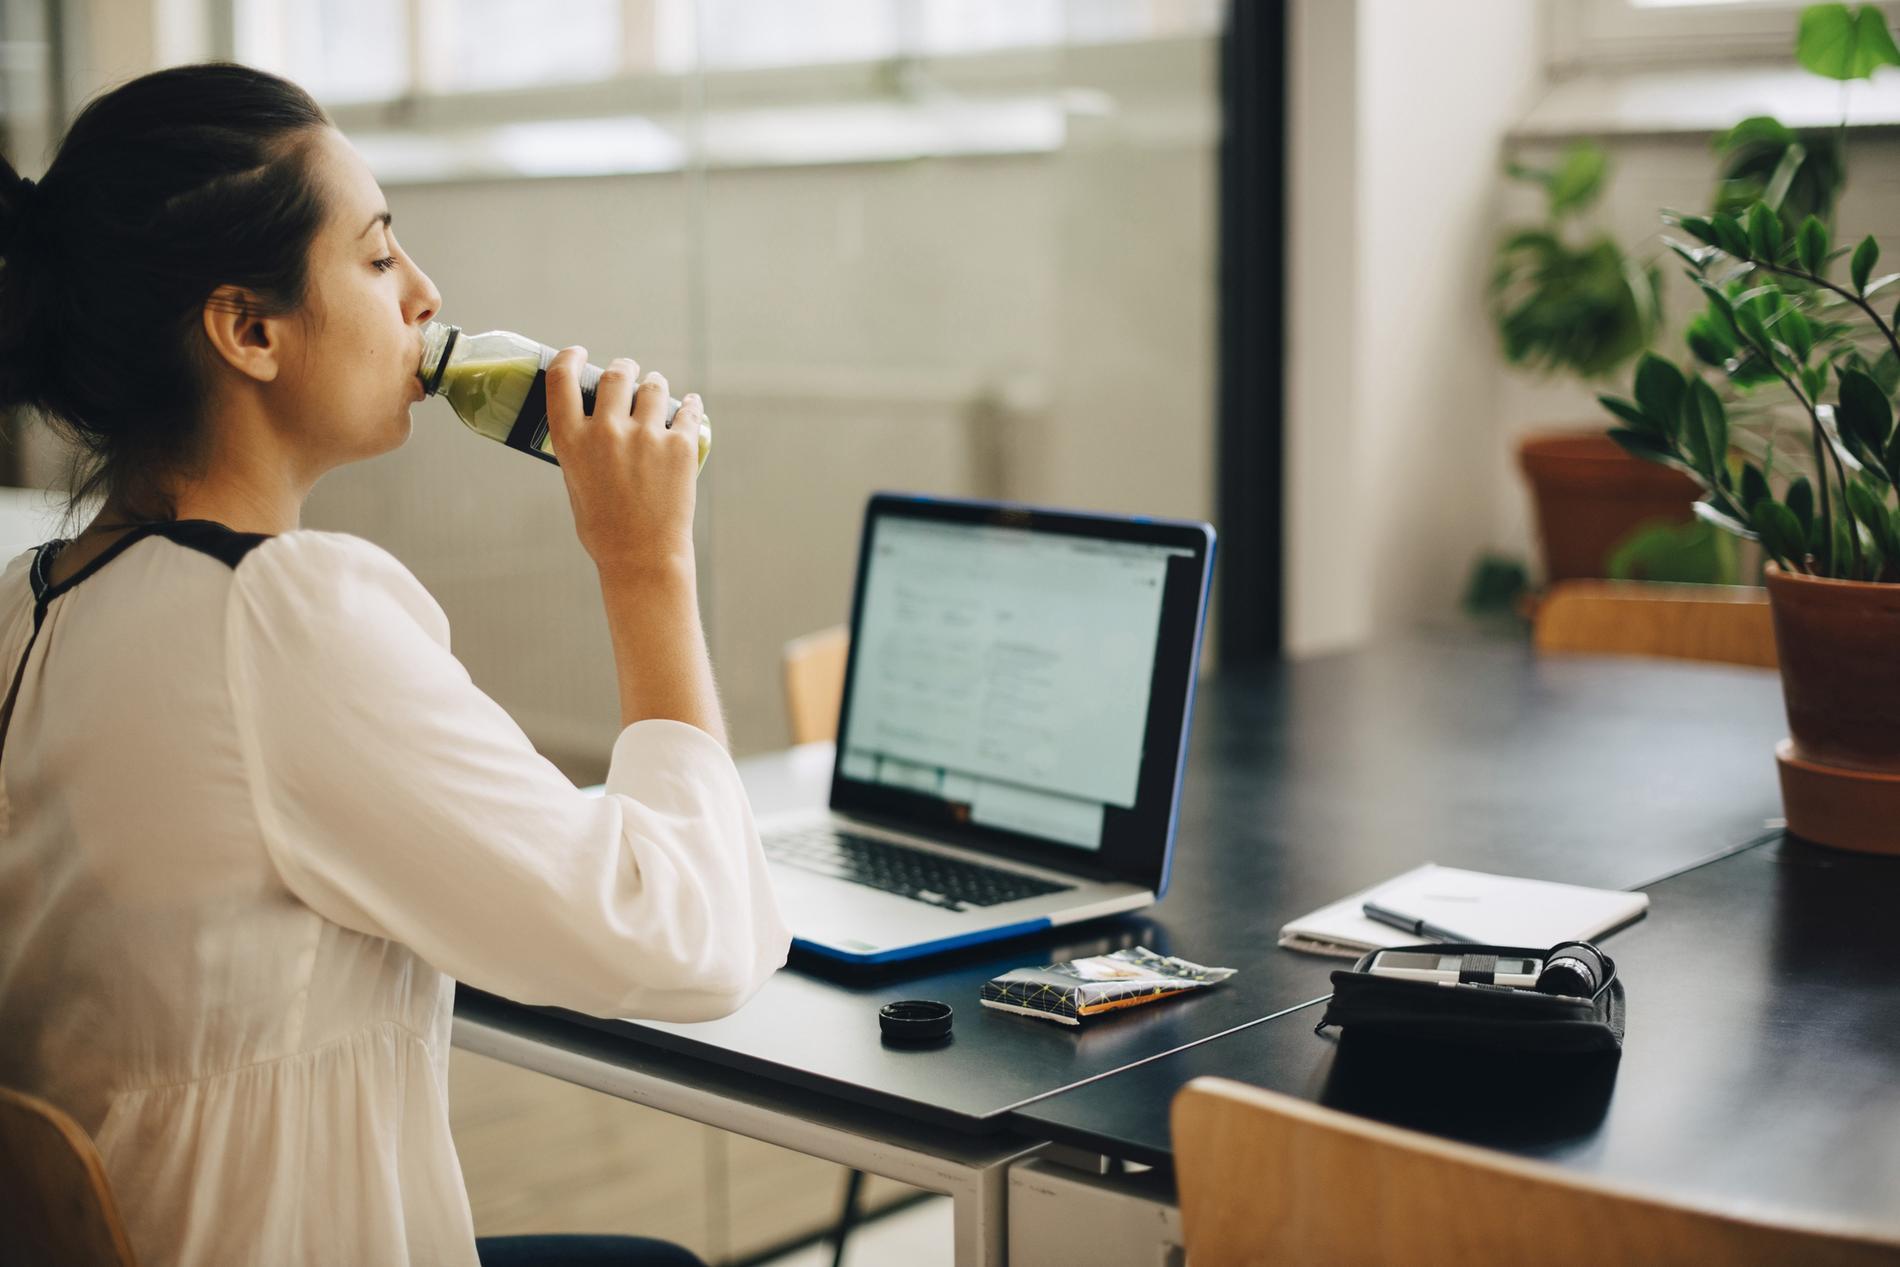 Sept alternatives au café pour relancer son énergie au bureau